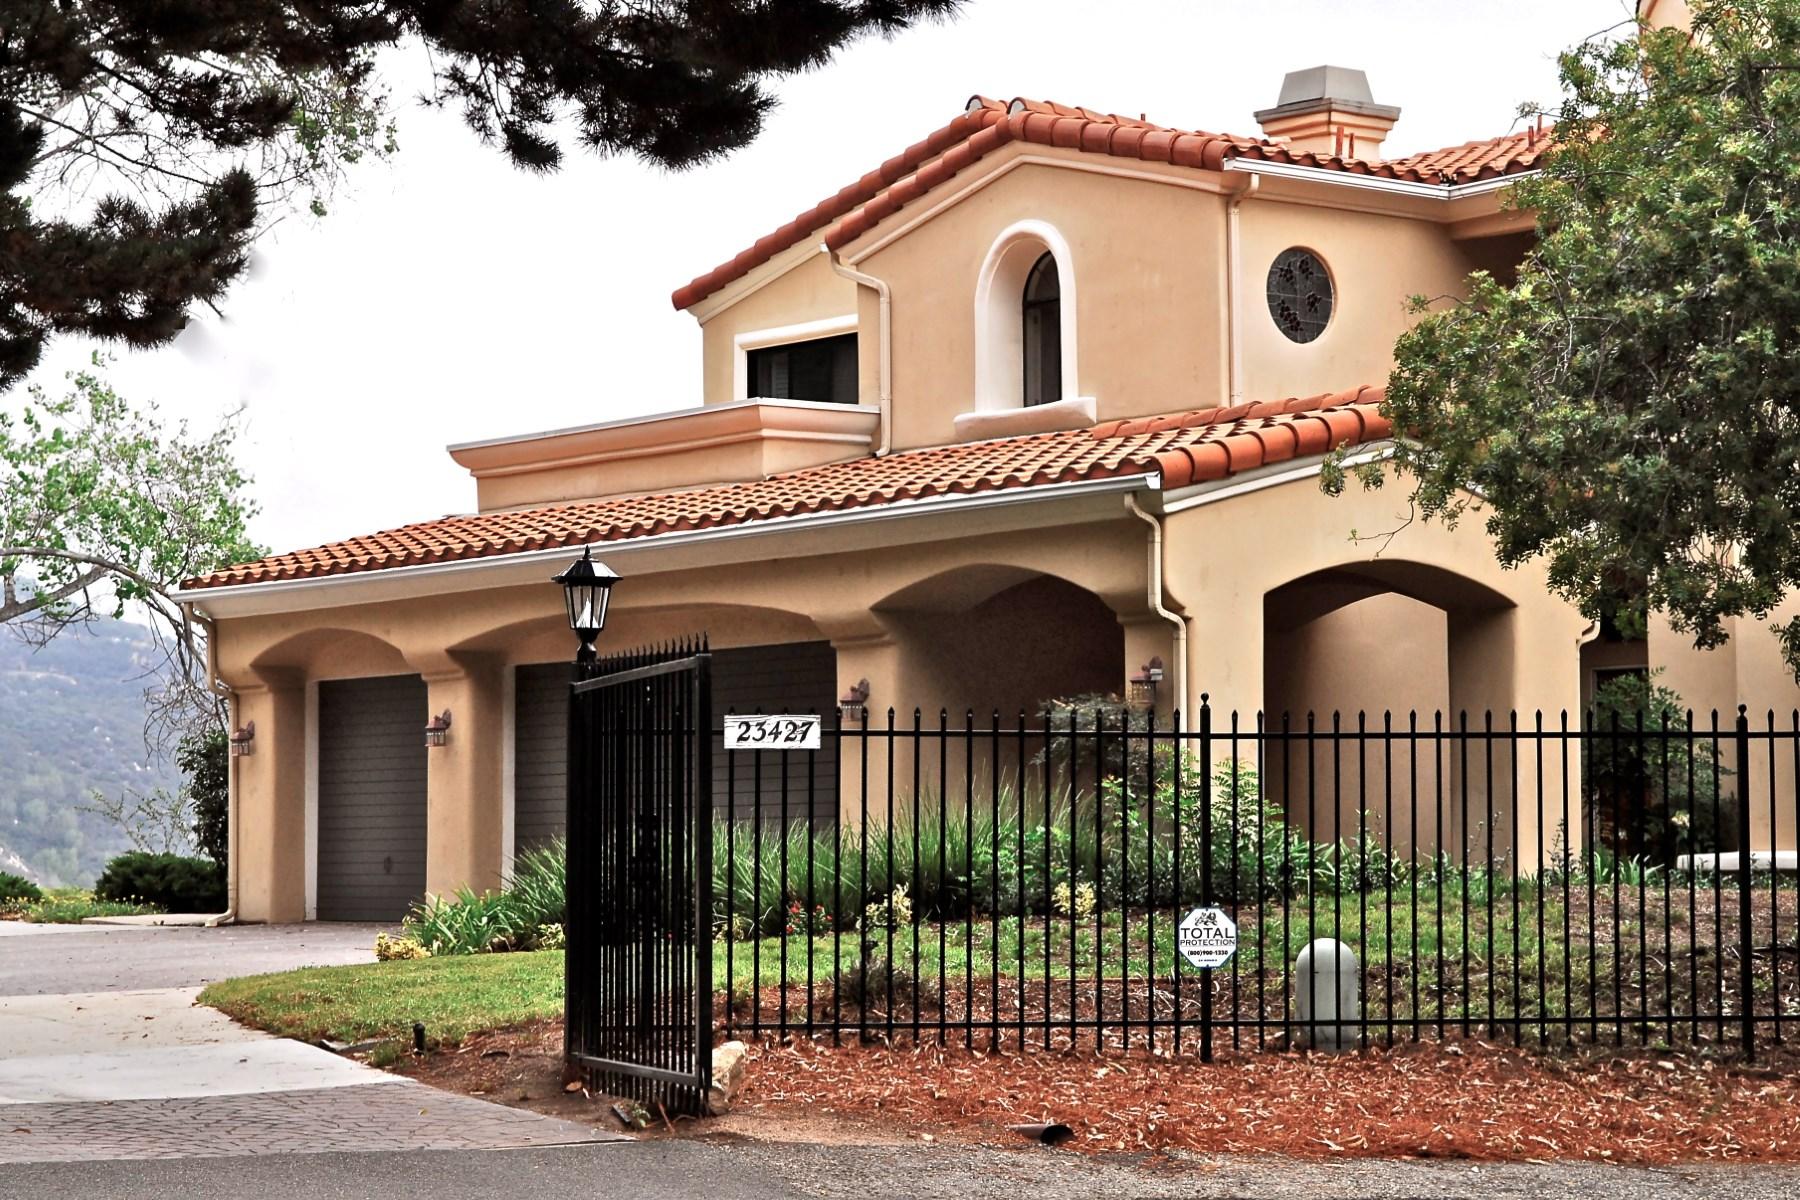 Single Family Home for Sale at Ocean and Mountain Views 23427 Copacabana Street Malibu, California 90265 United States